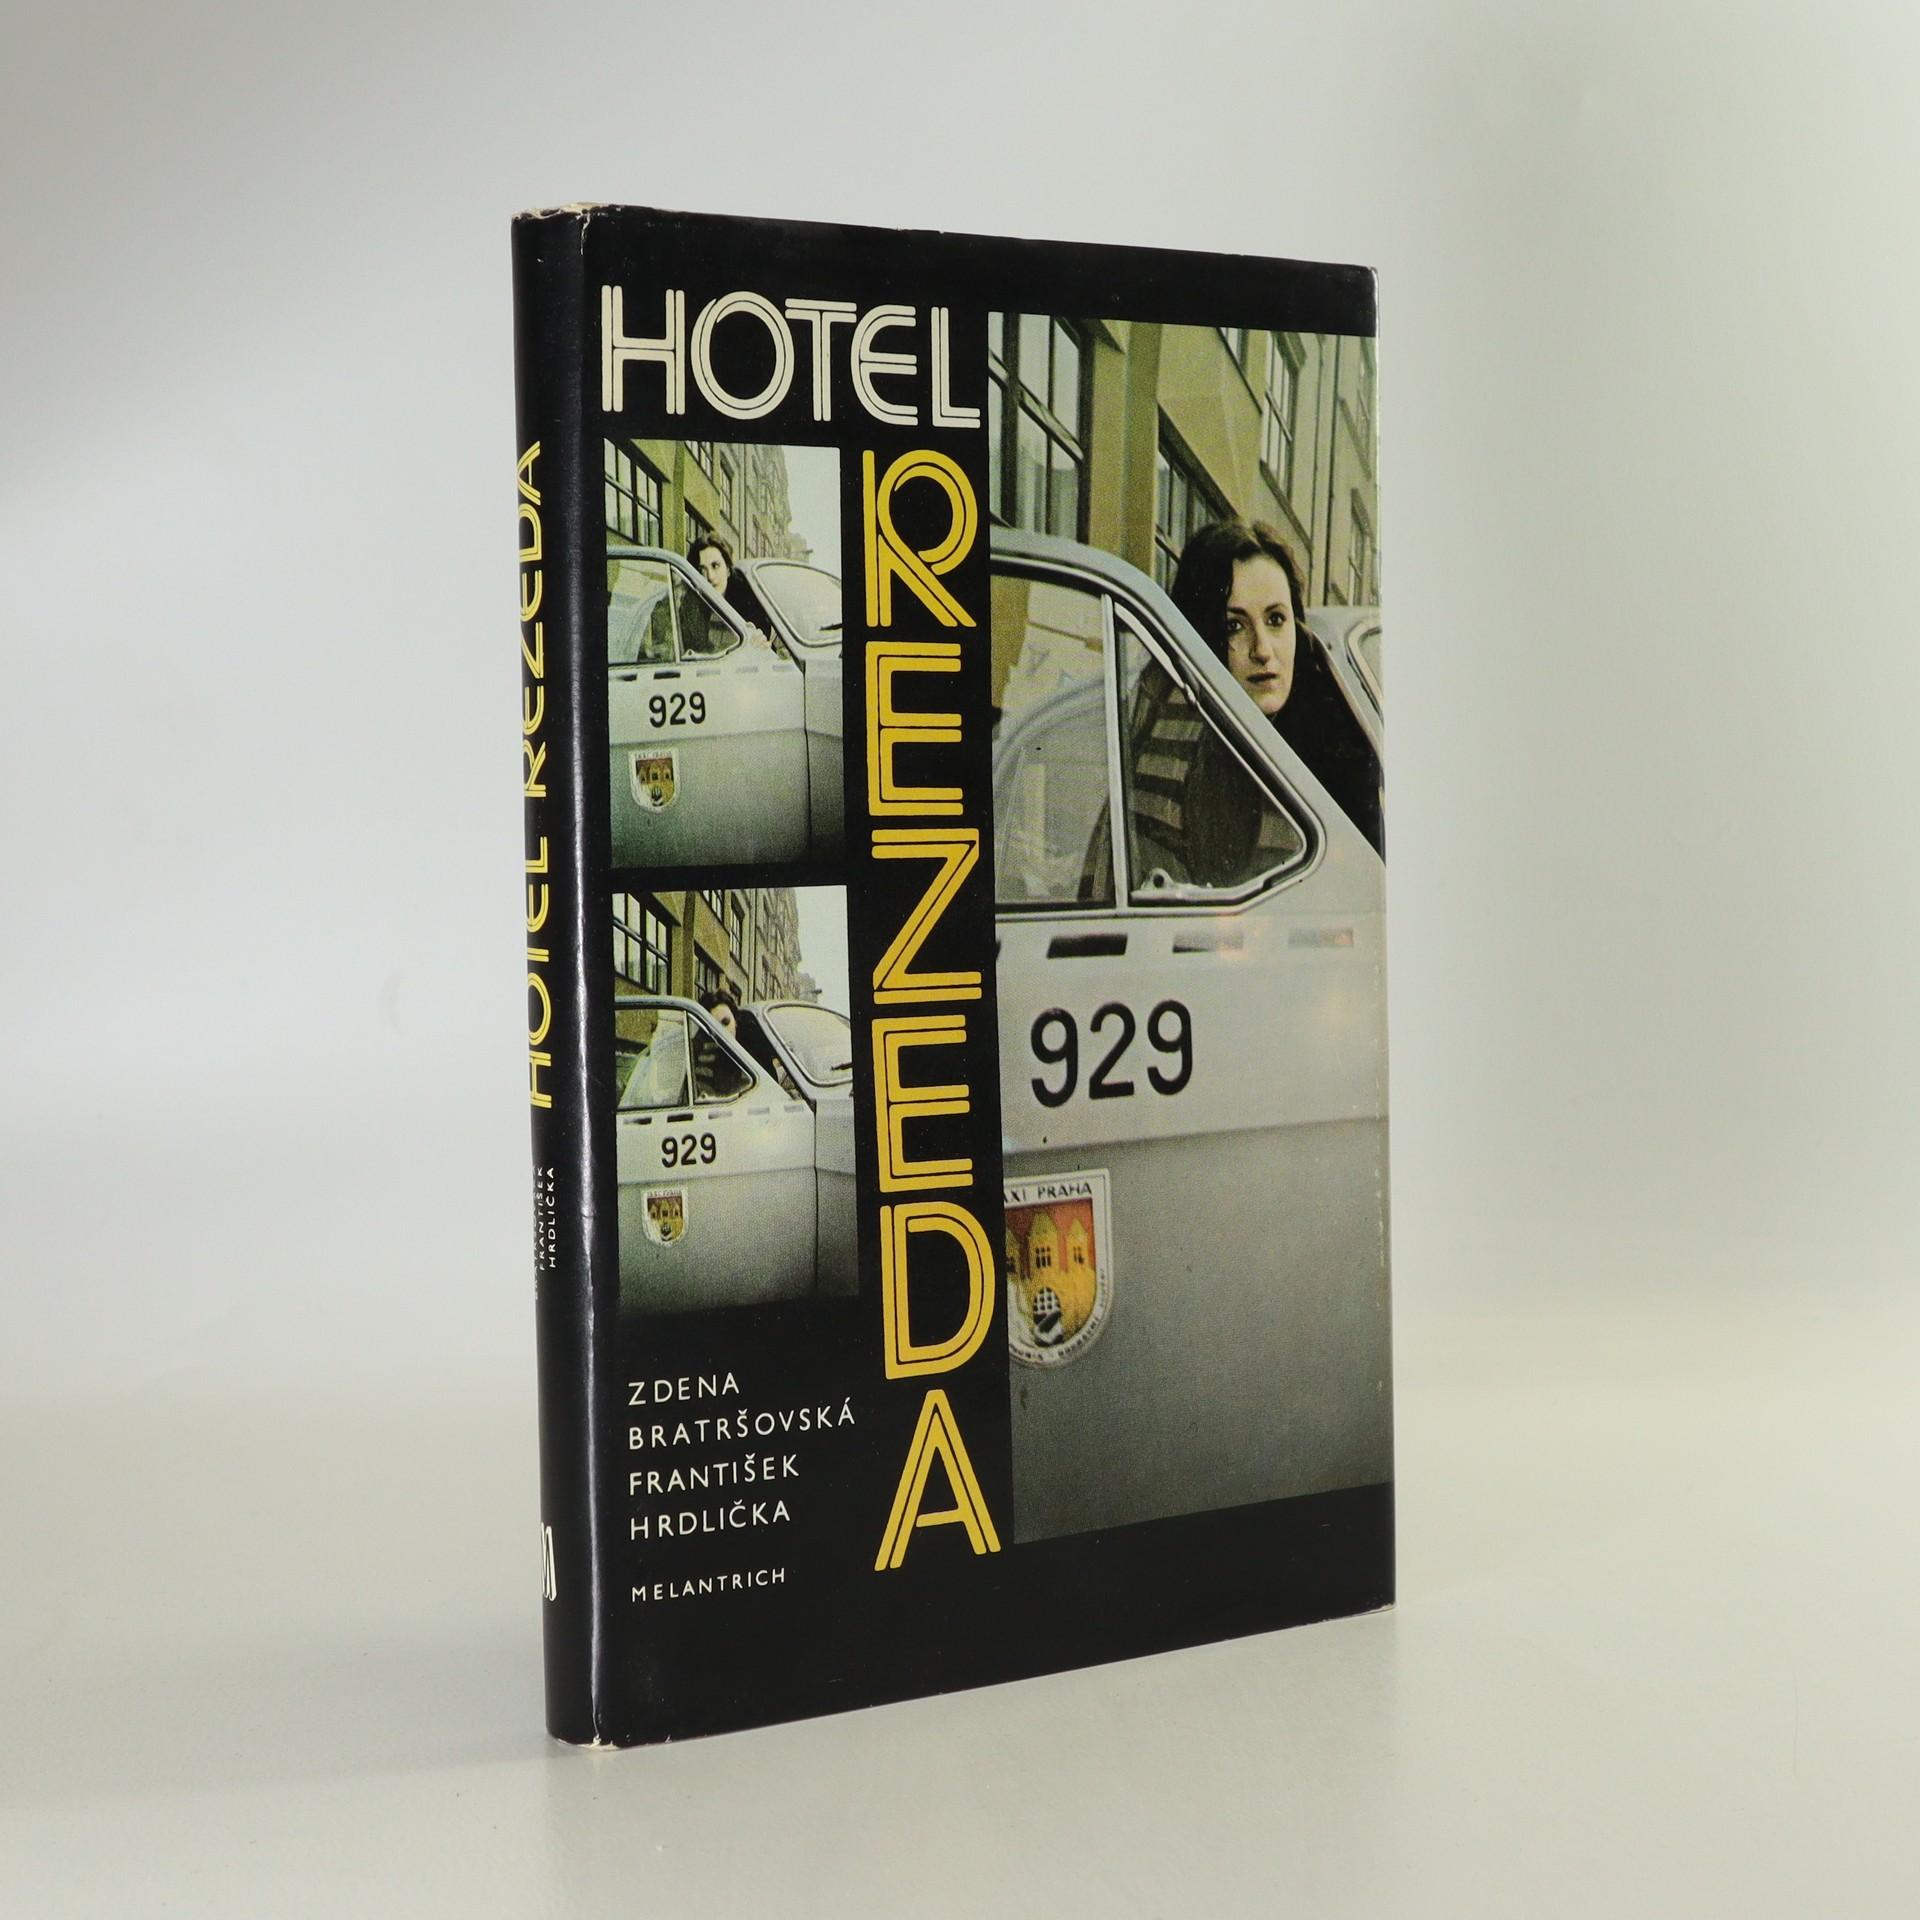 antikvární kniha Hotel Rezeda, 1987